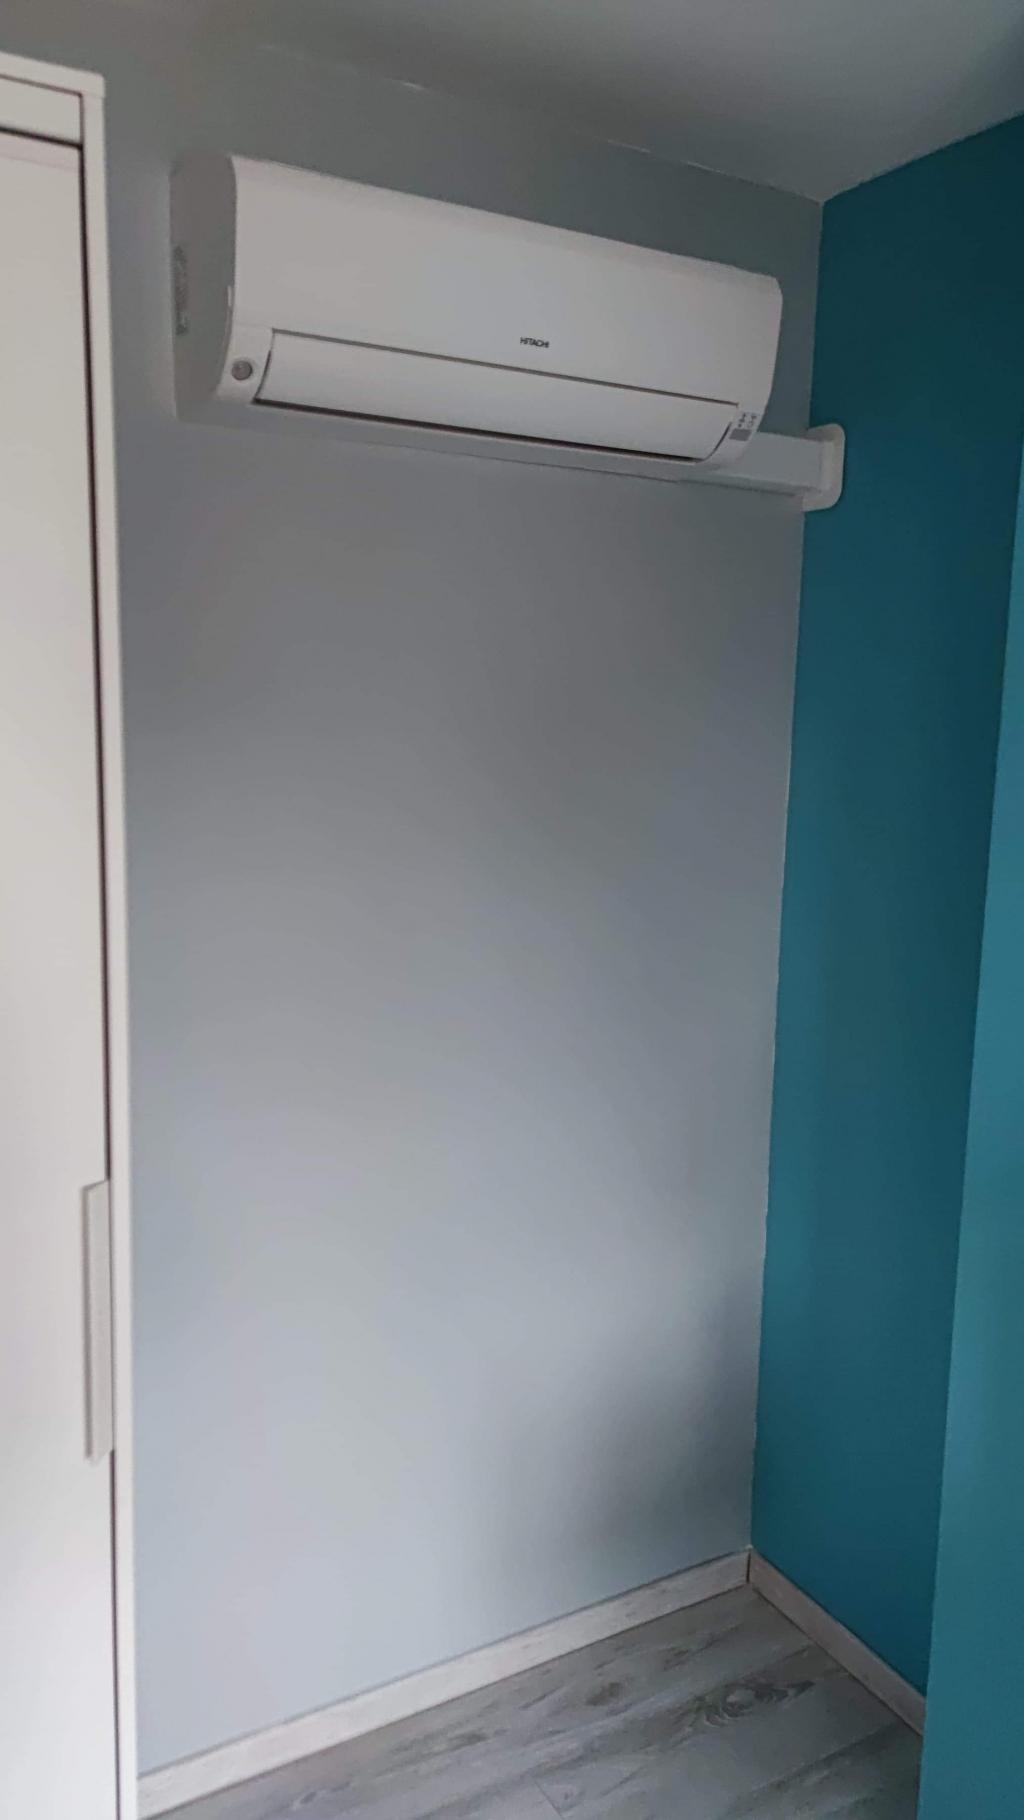 Installateur HITACHI : Installation d'une climatisation de marque HITACHI type MOKAI à BOUGLIGNY 77